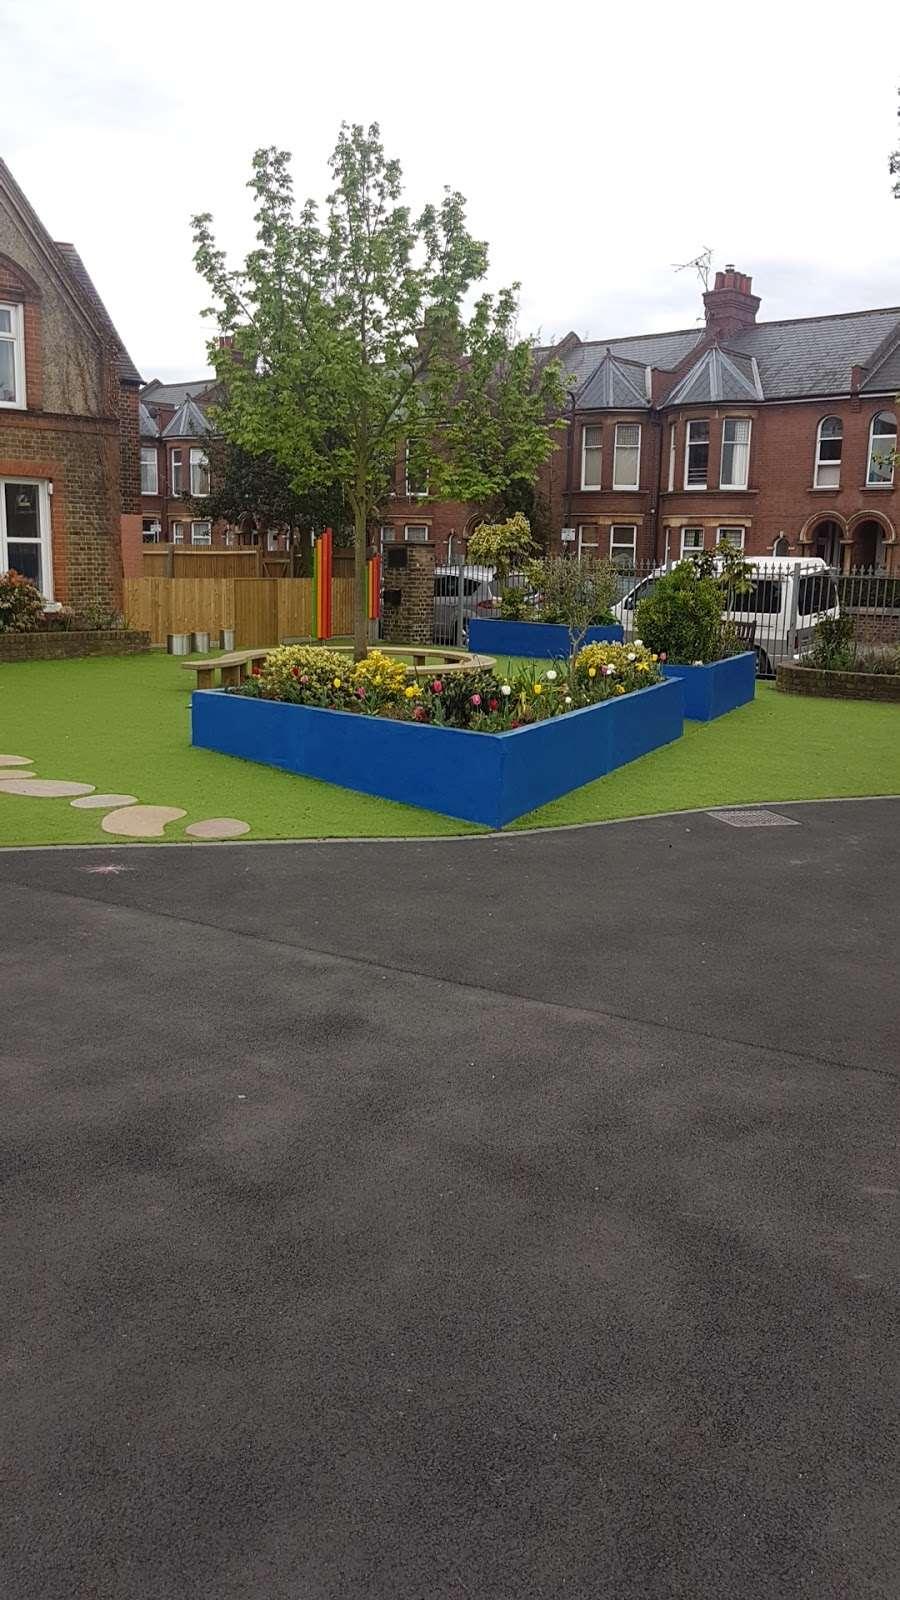 Telferscot Primary School - school  | Photo 4 of 10 | Address: Telferscot Rd, London SW12 0HW, UK | Phone: 020 8673 7362